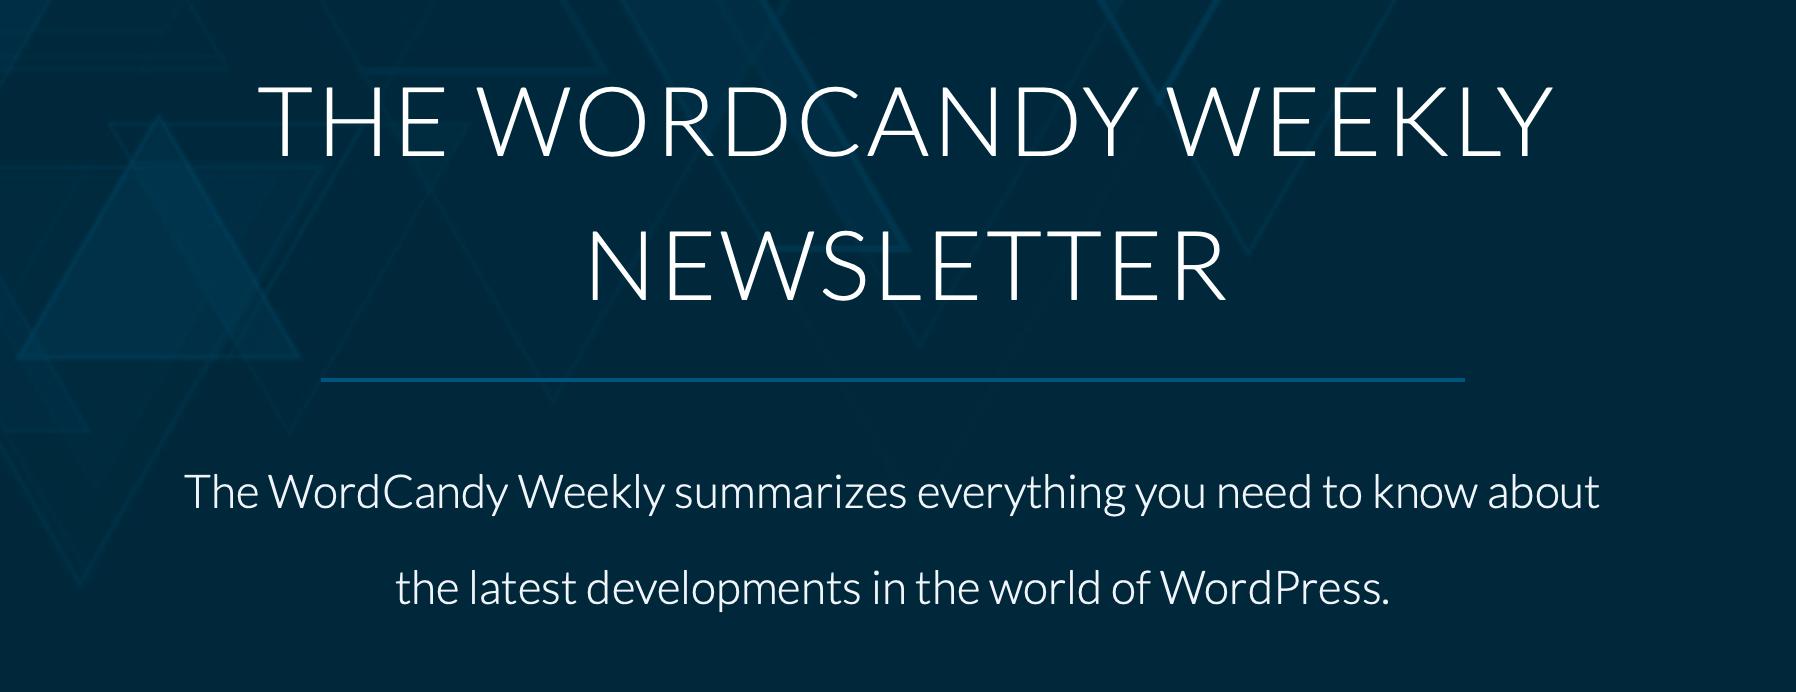 WordCandy每周WordPress新闻简报横幅。